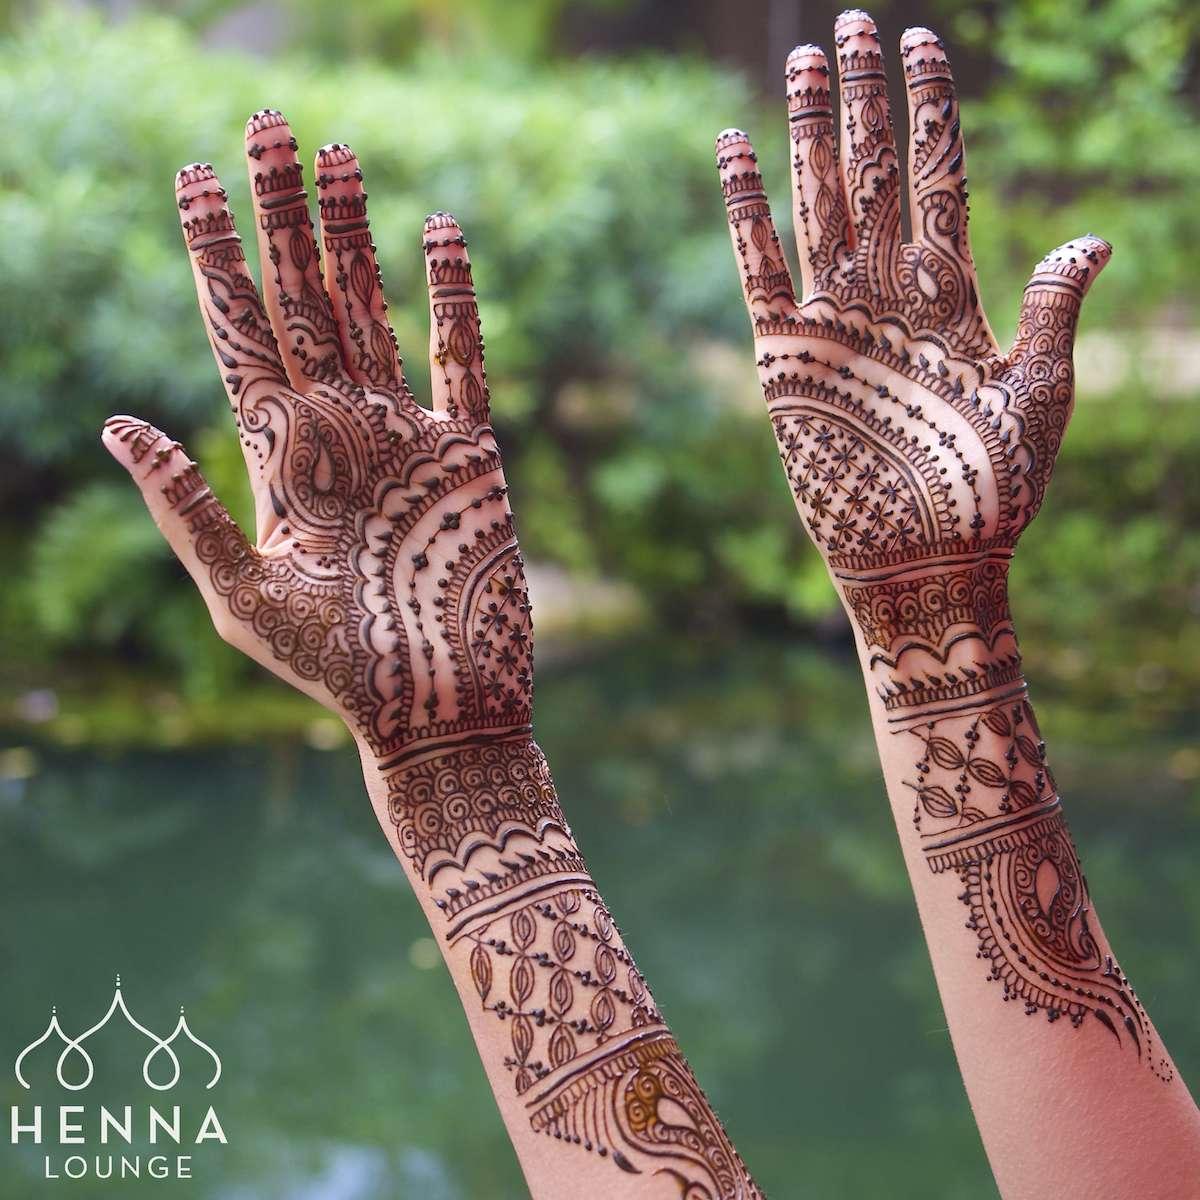 Henna with a lush jungle setting at the Fairmont Mayakoba